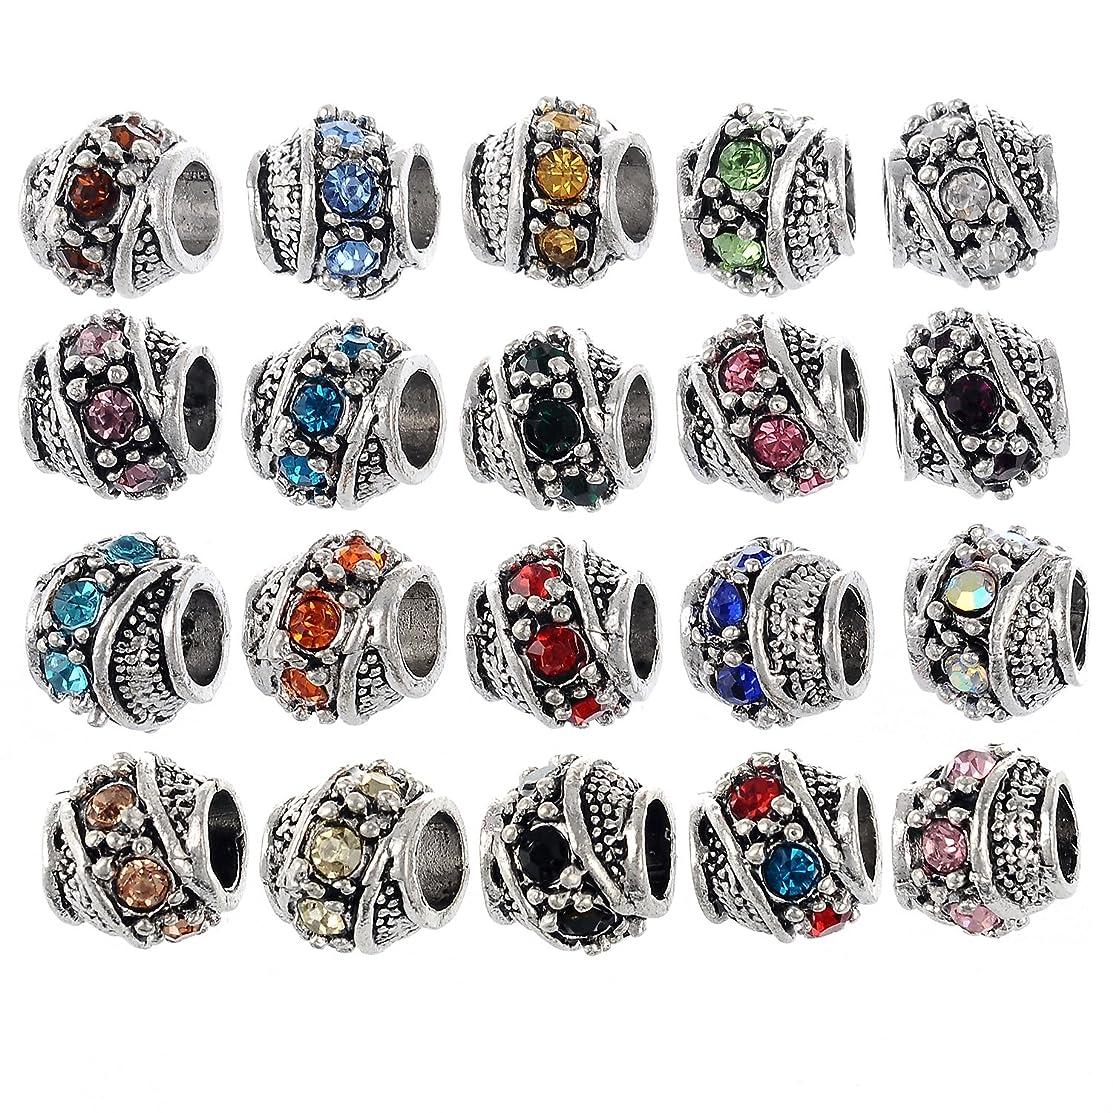 RUBYCA 60Pcs Silver Color Tibetan Charm Beads Crystals Rhinestones fit European Charm Bracelet Mix Color